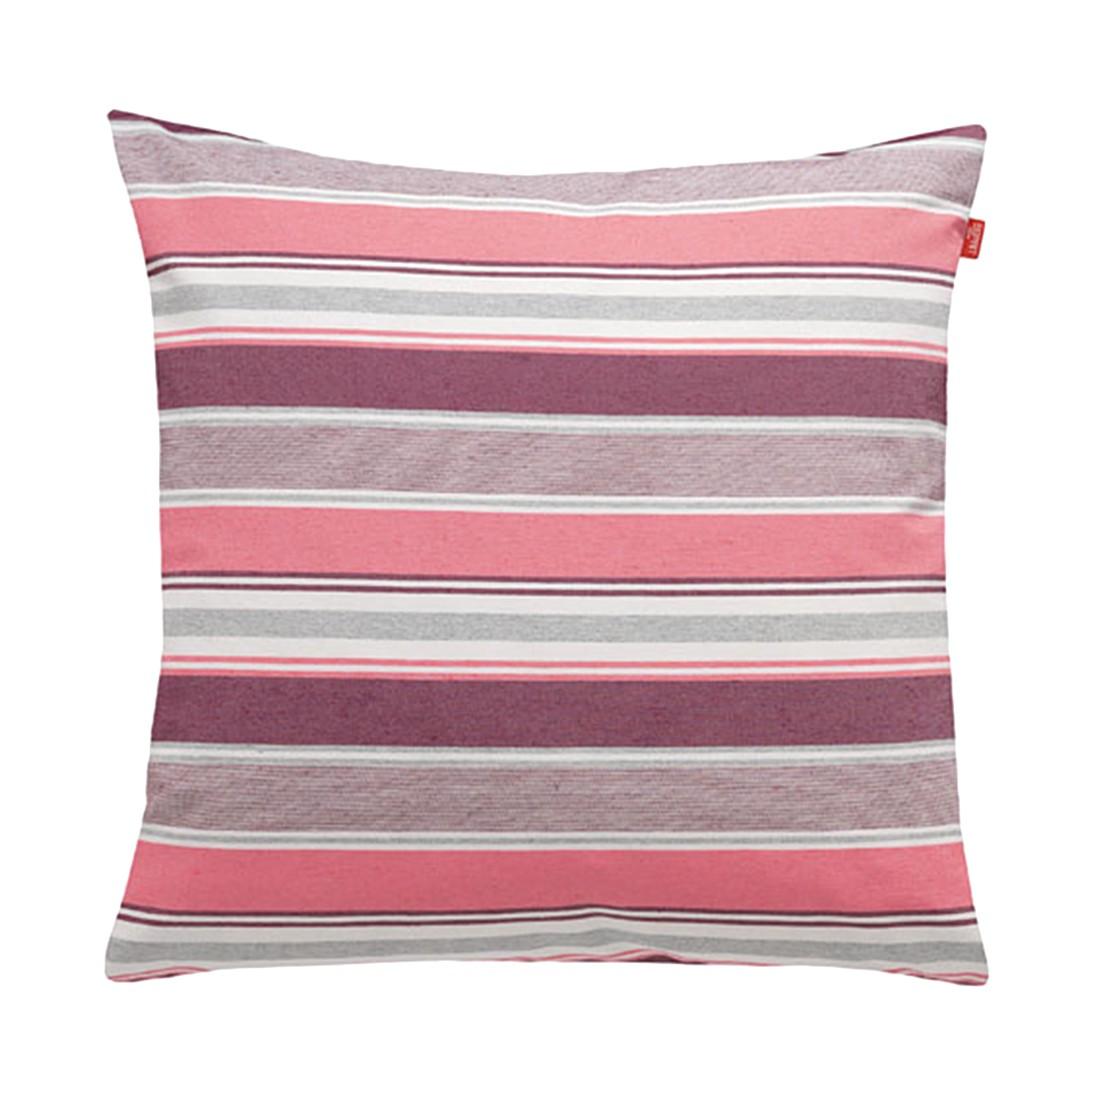 Kissenhülle E-Coloured – Rot, Esprit Home günstig kaufen